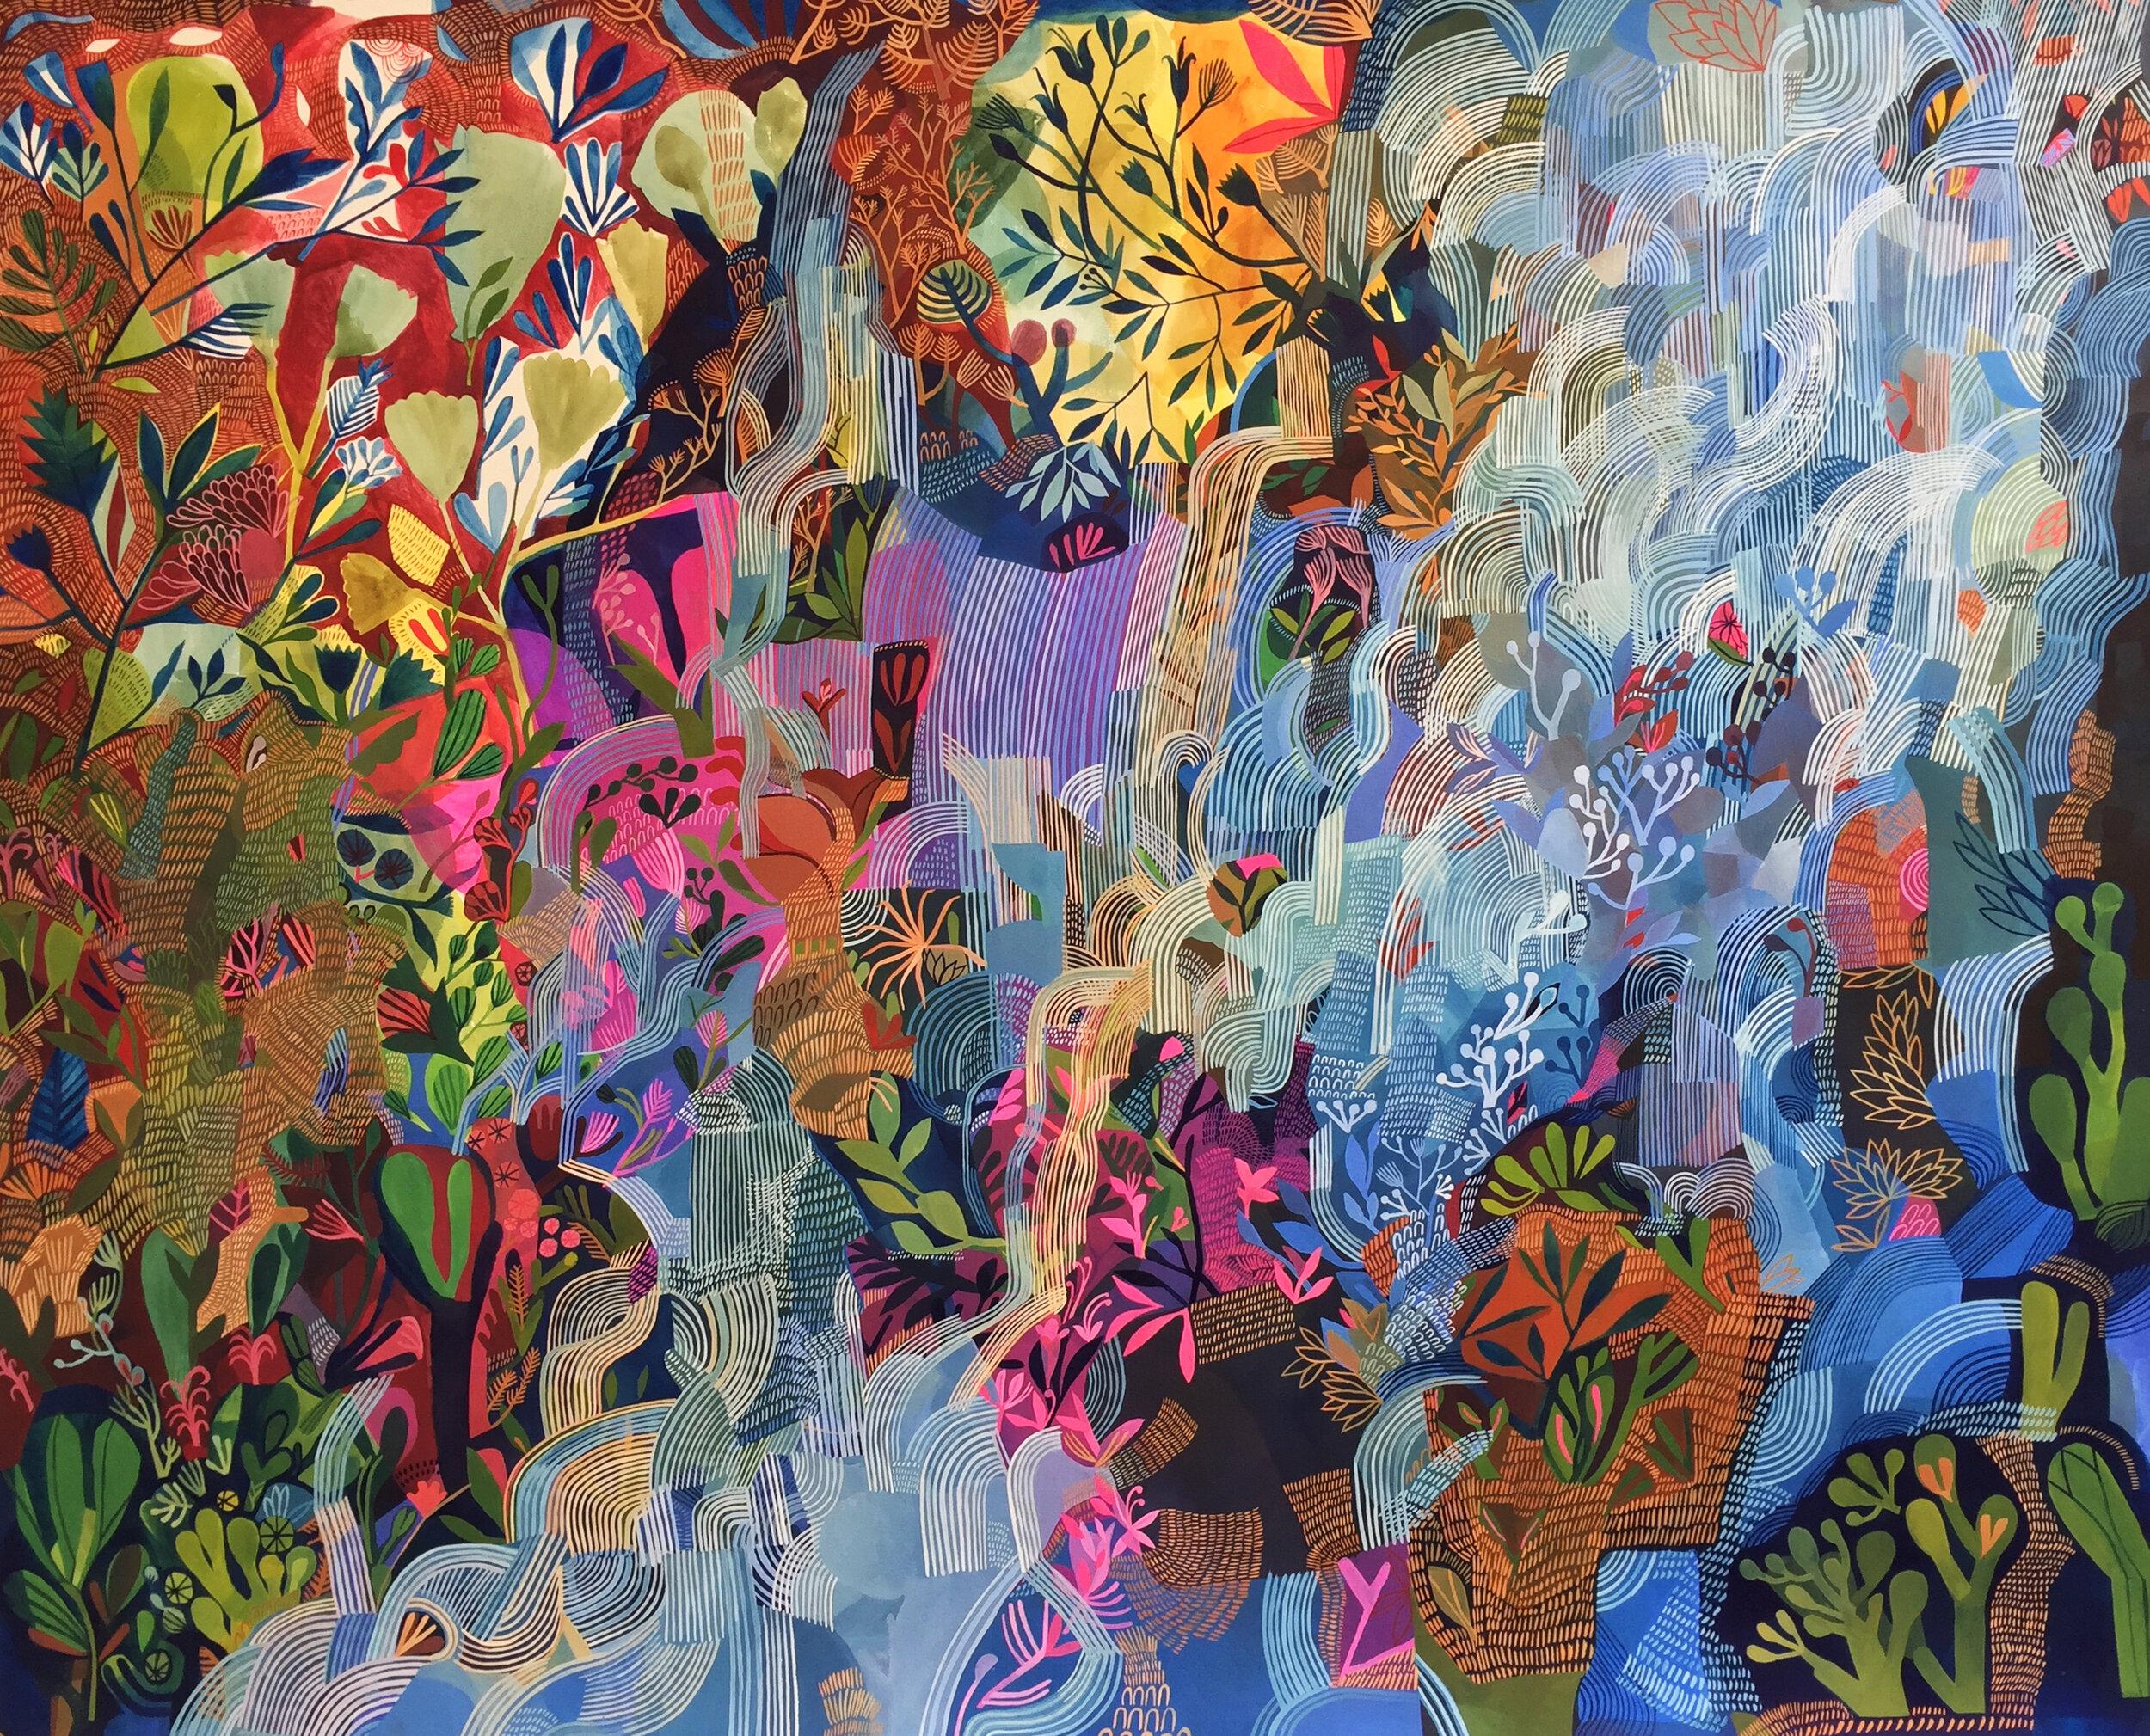 'Tumbling Waterfalls' / Ashley Amery / 2019 / 120 x 150cm / Gouache on Paper